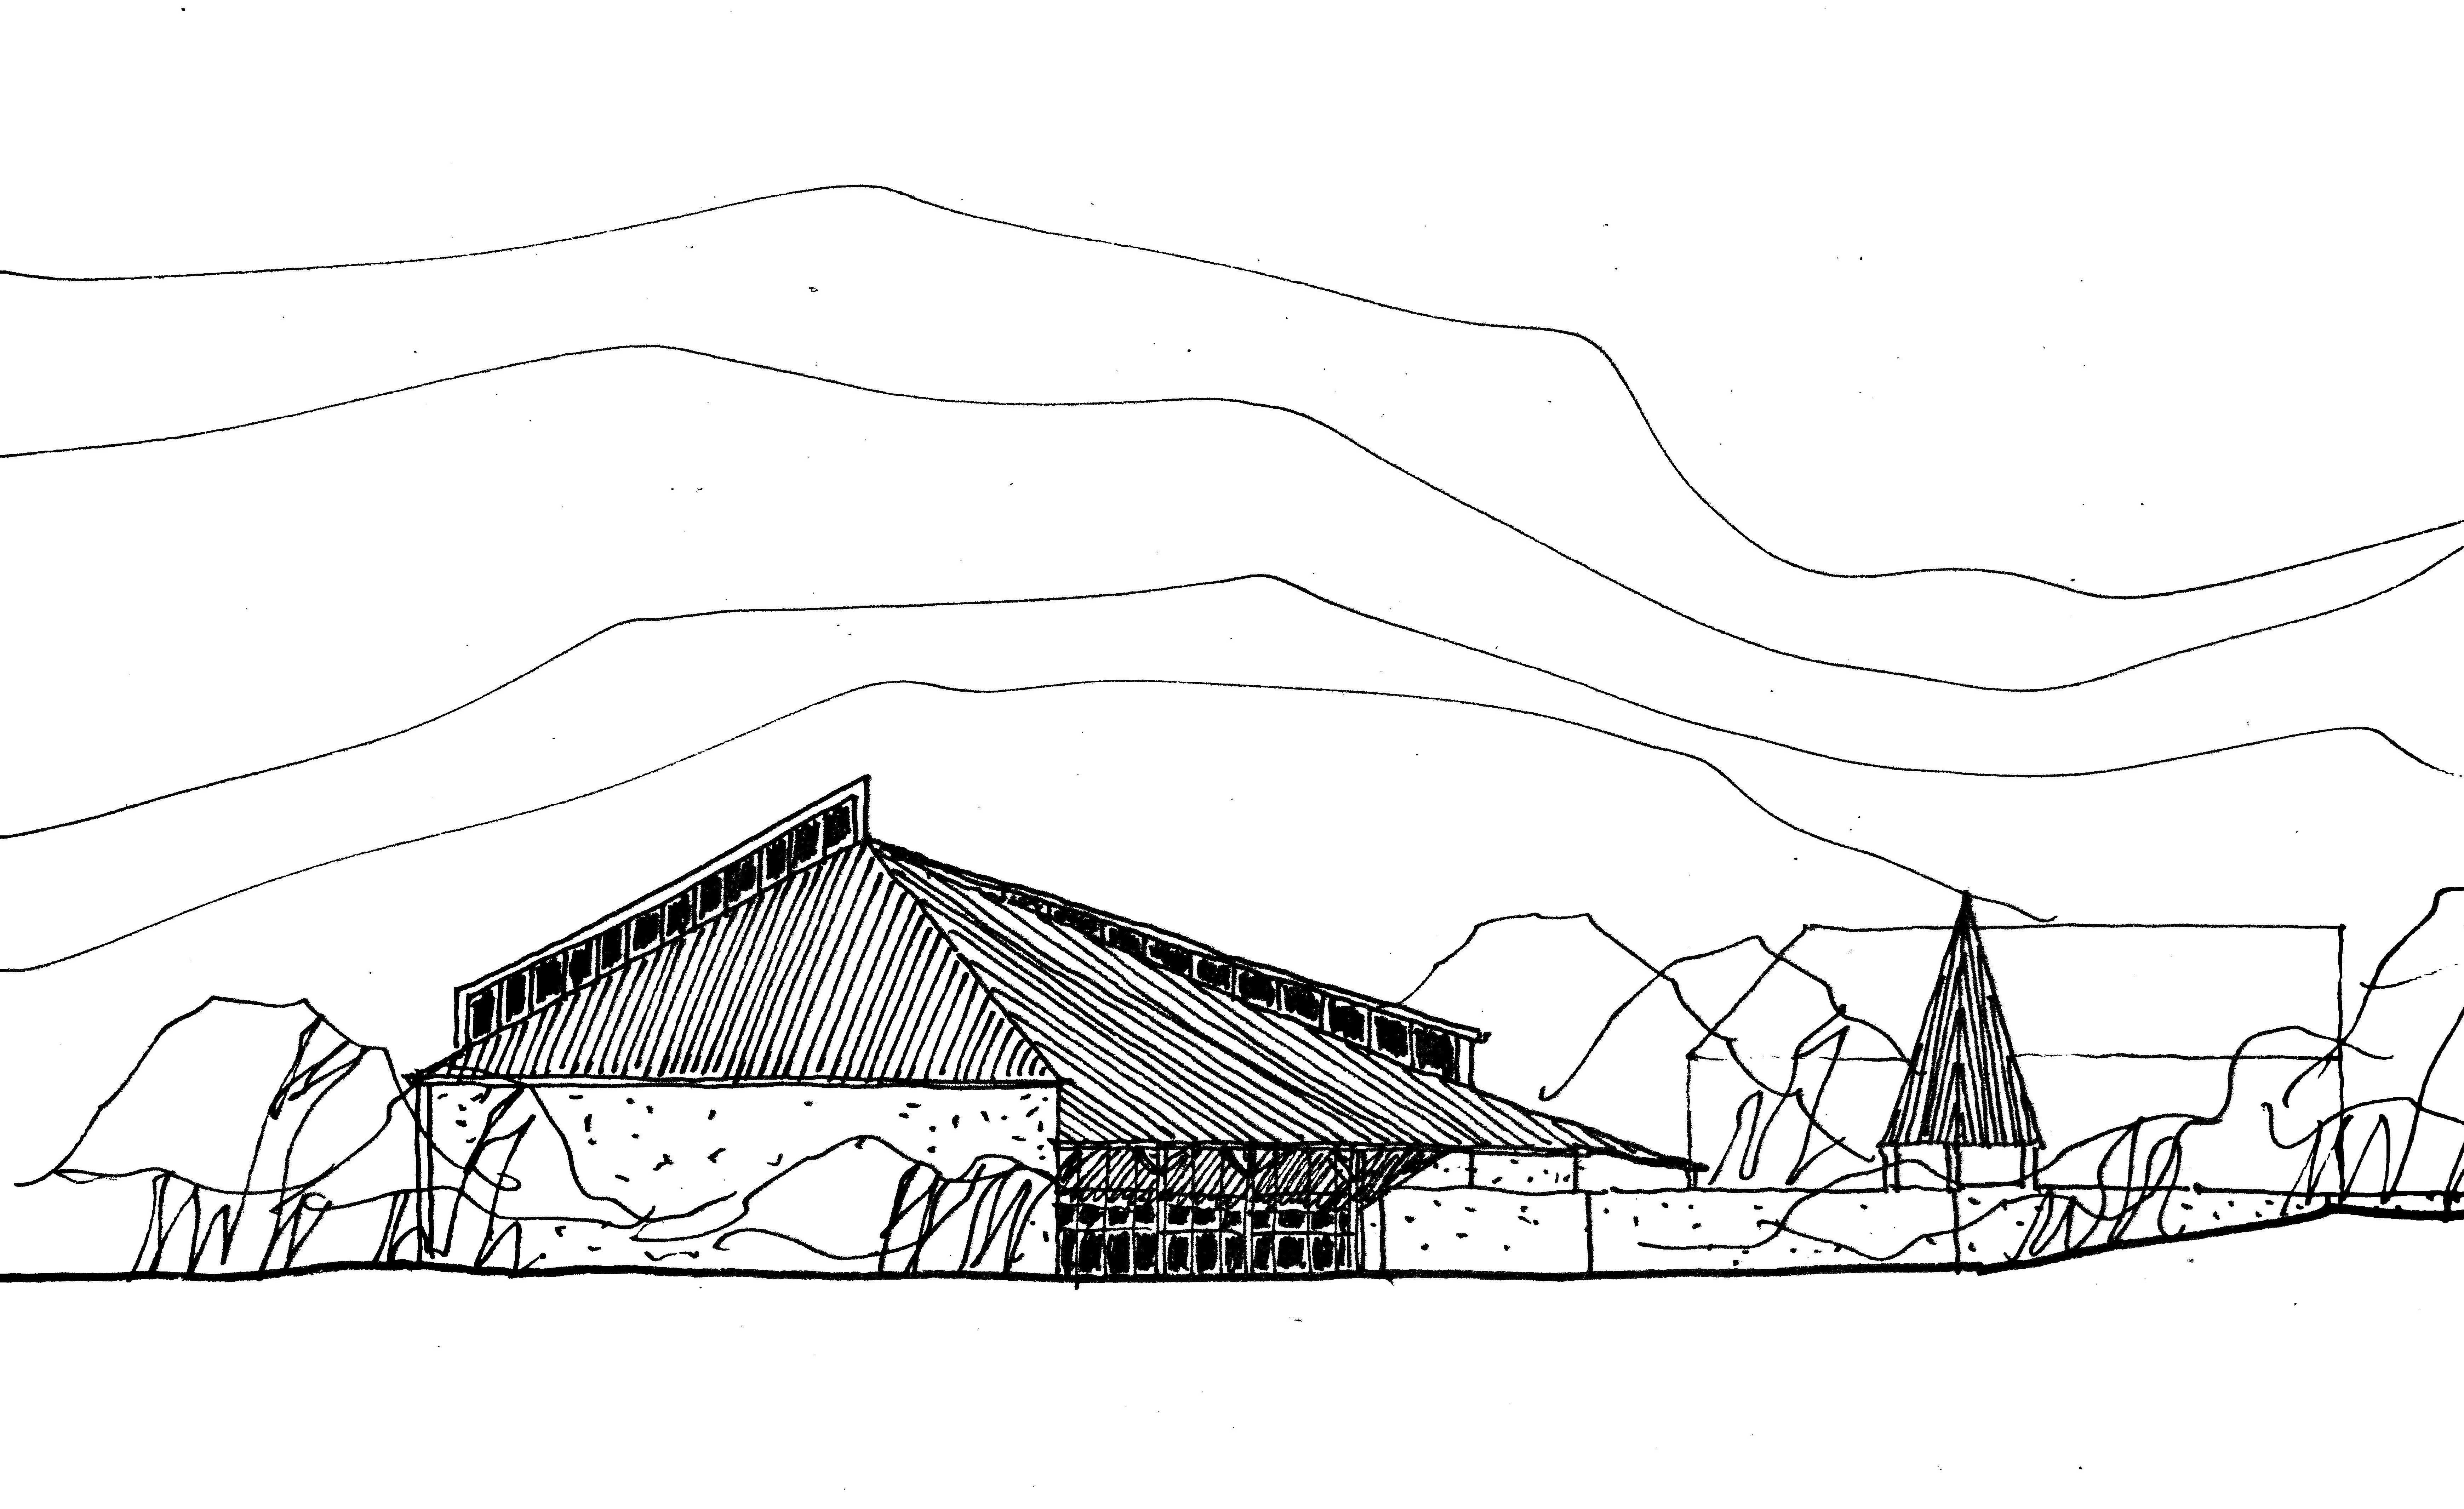 Datei:Erster Entwurf einer neuen Kirche in Oberisling.jpg – Wikipedia